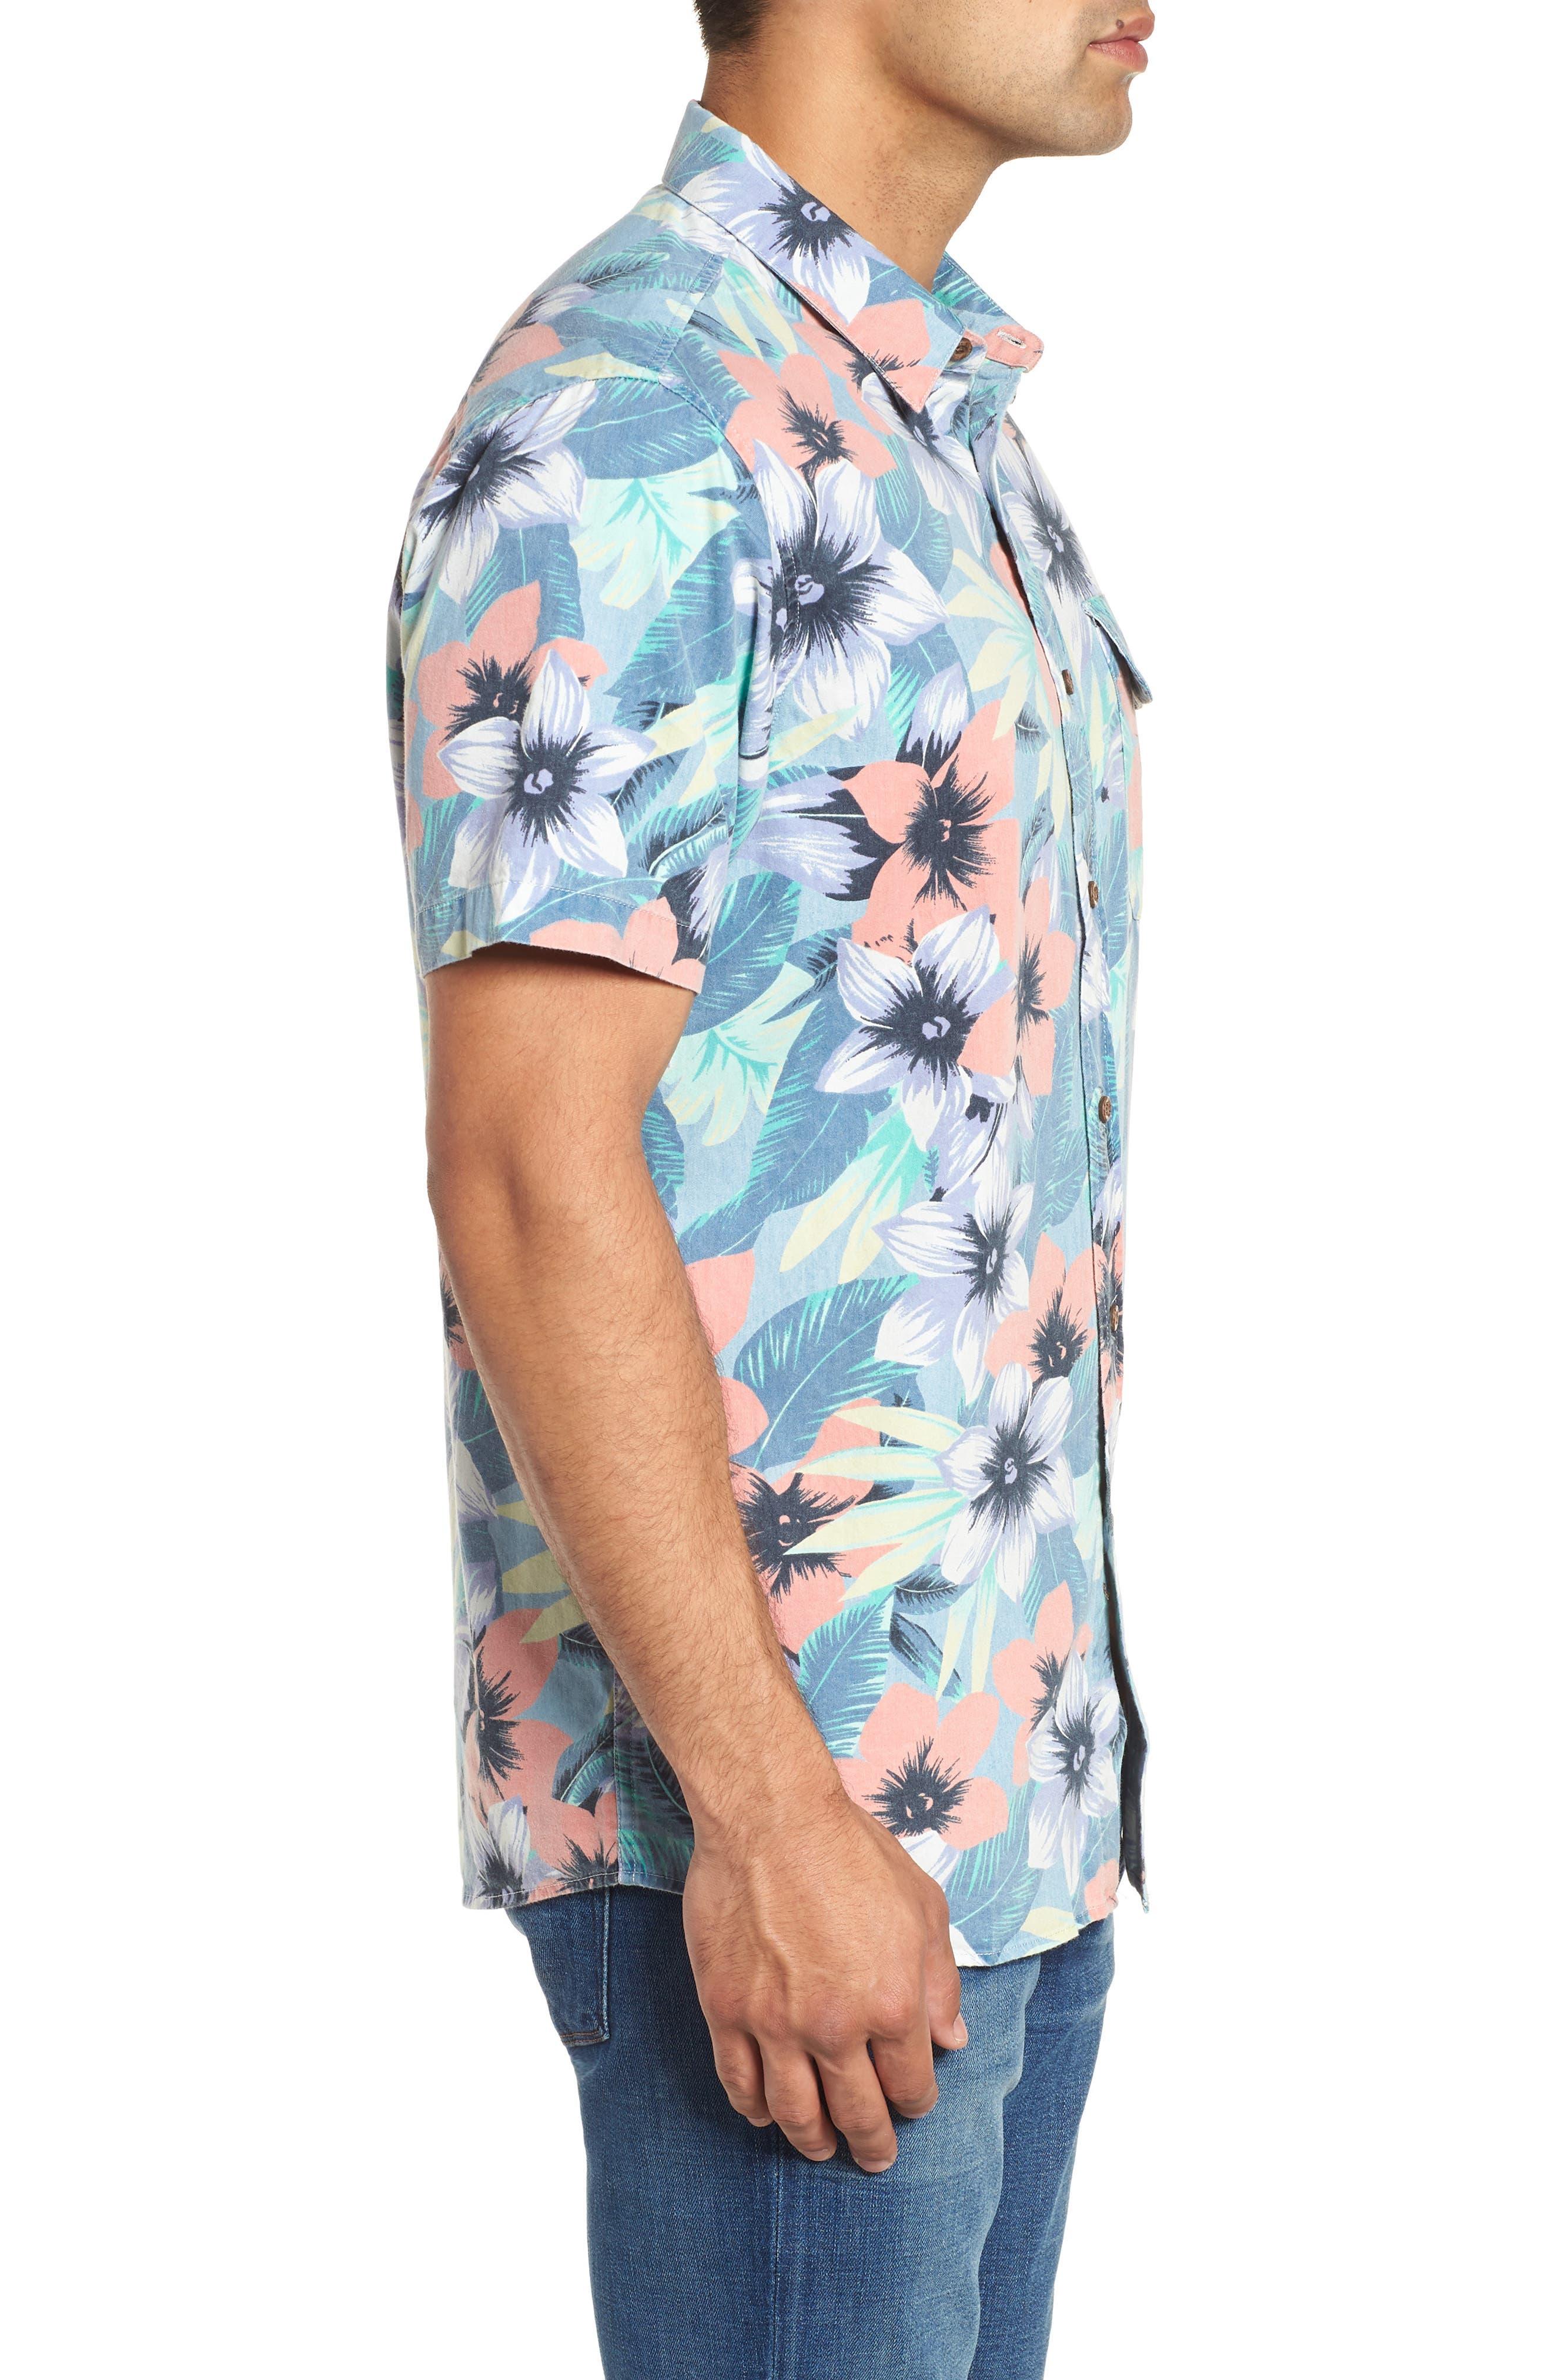 Meledrone Woven Shirt,                             Alternate thumbnail 6, color,